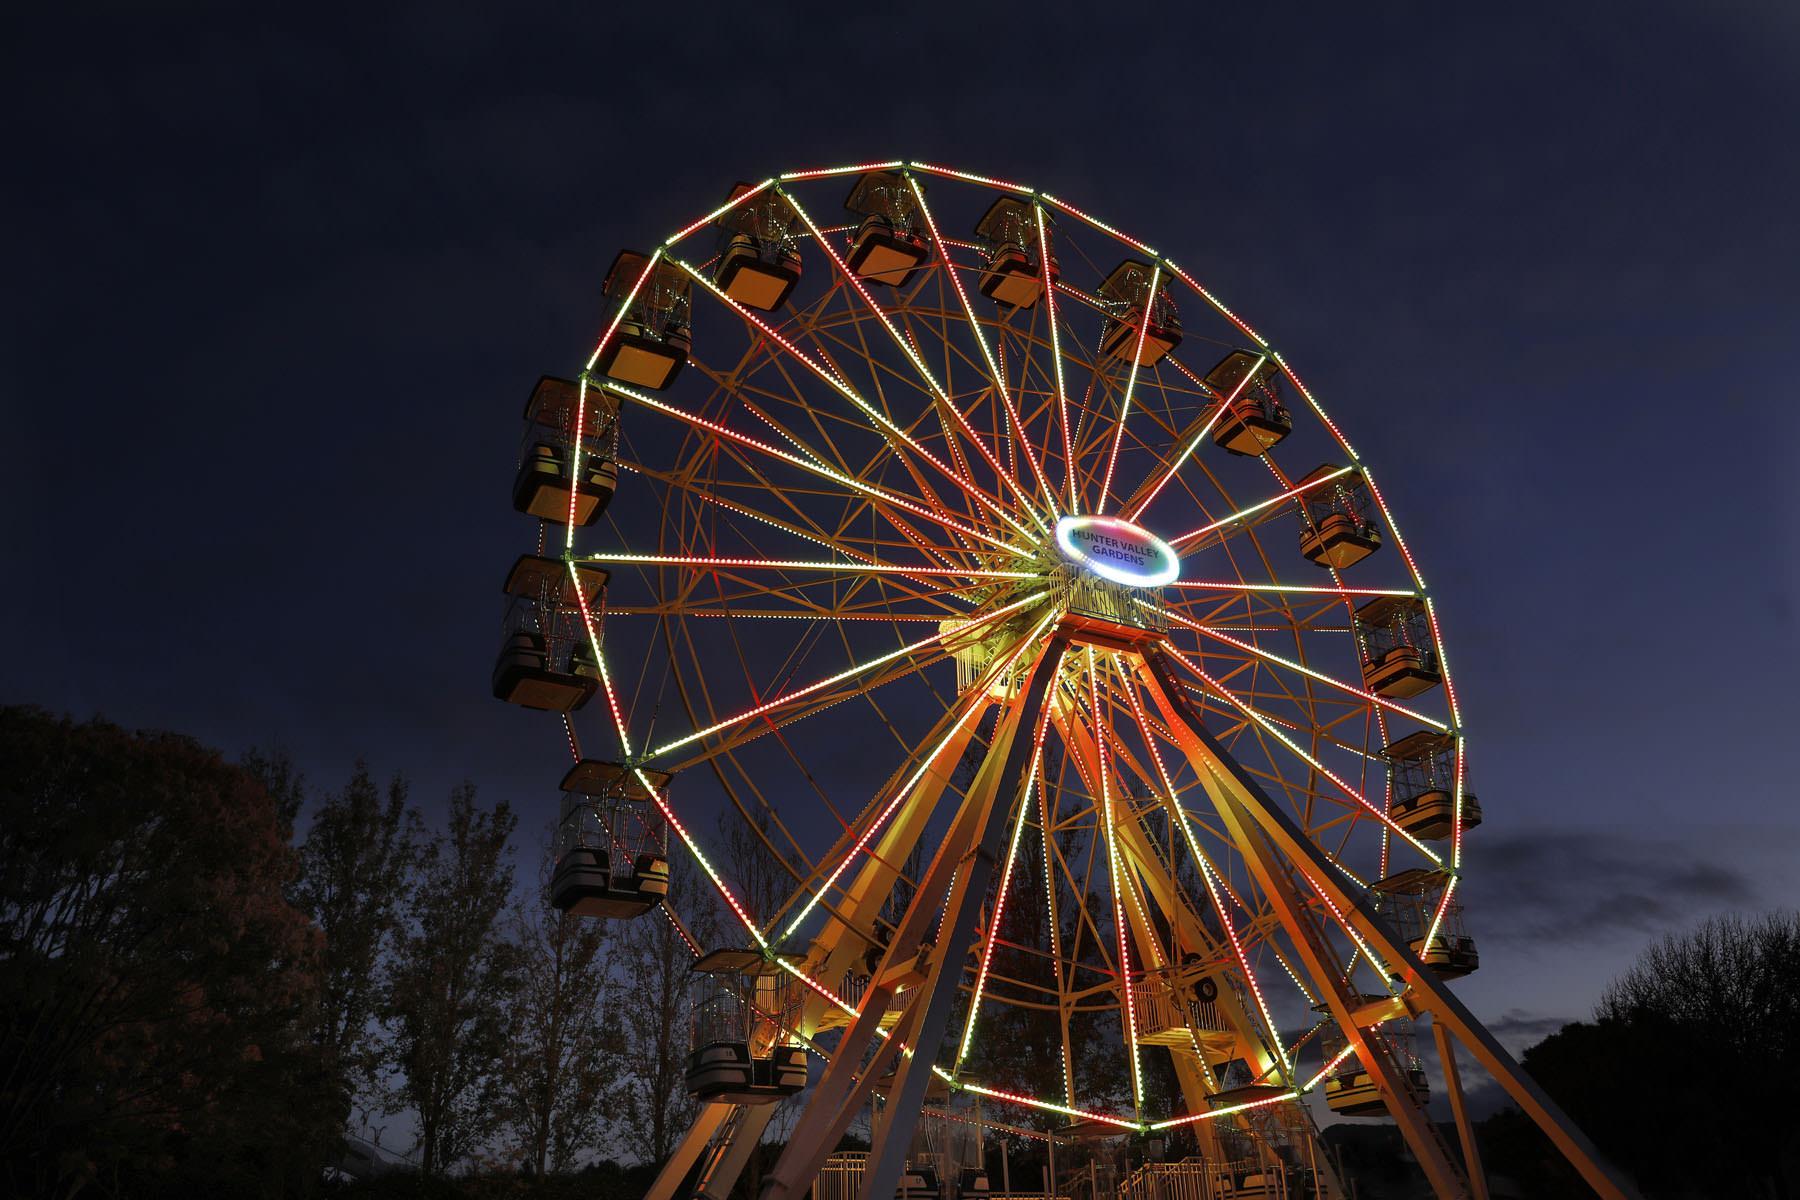 Free photo: Ferris Wheel - Ride, Wheel, Metal - Free ...